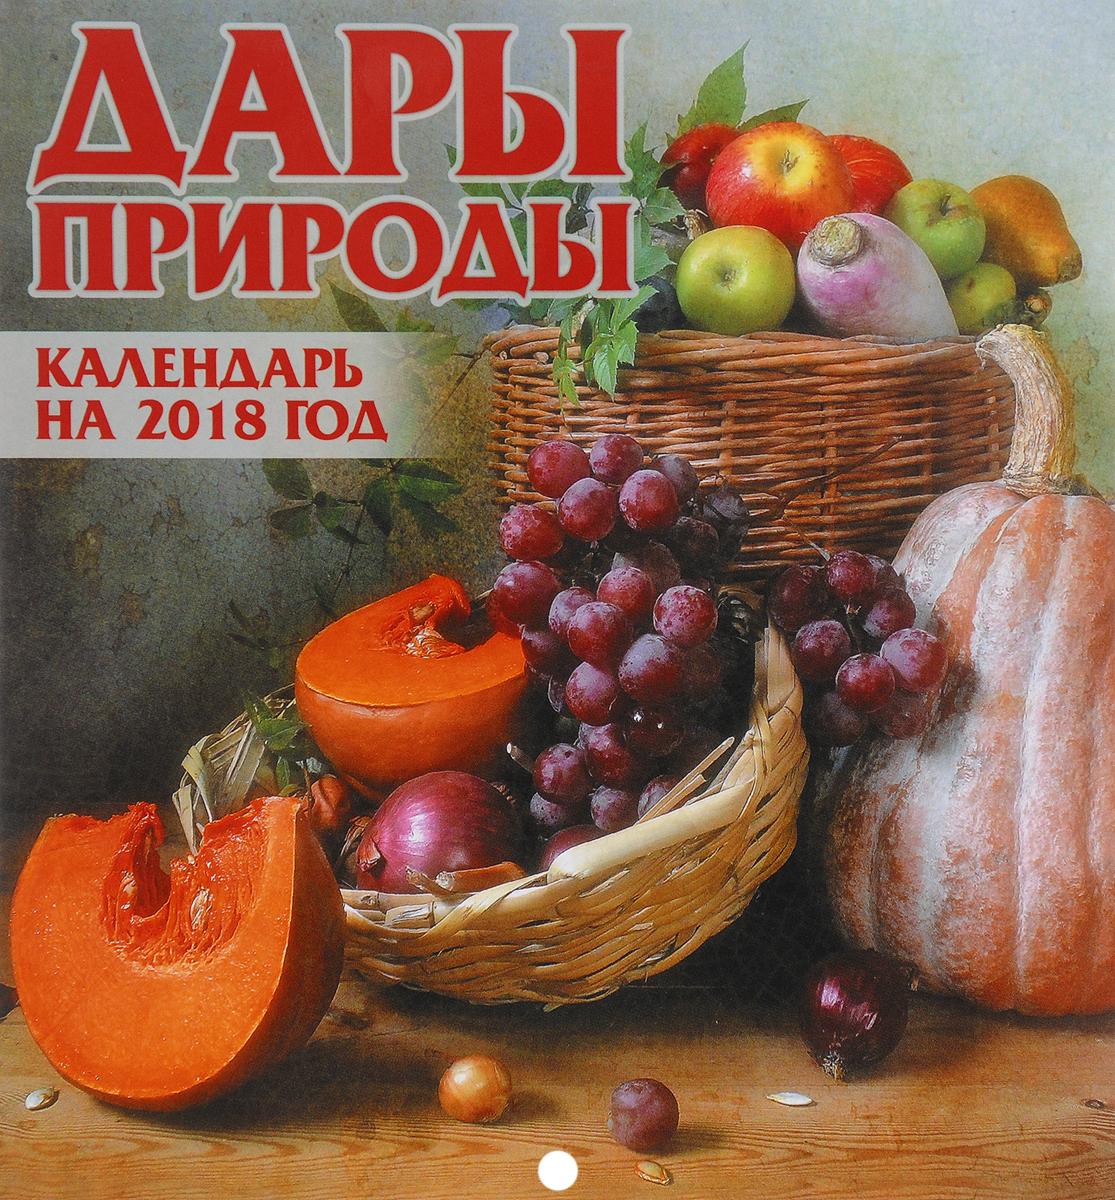 Календарь на 2018 год (на скрепке). Дары природы